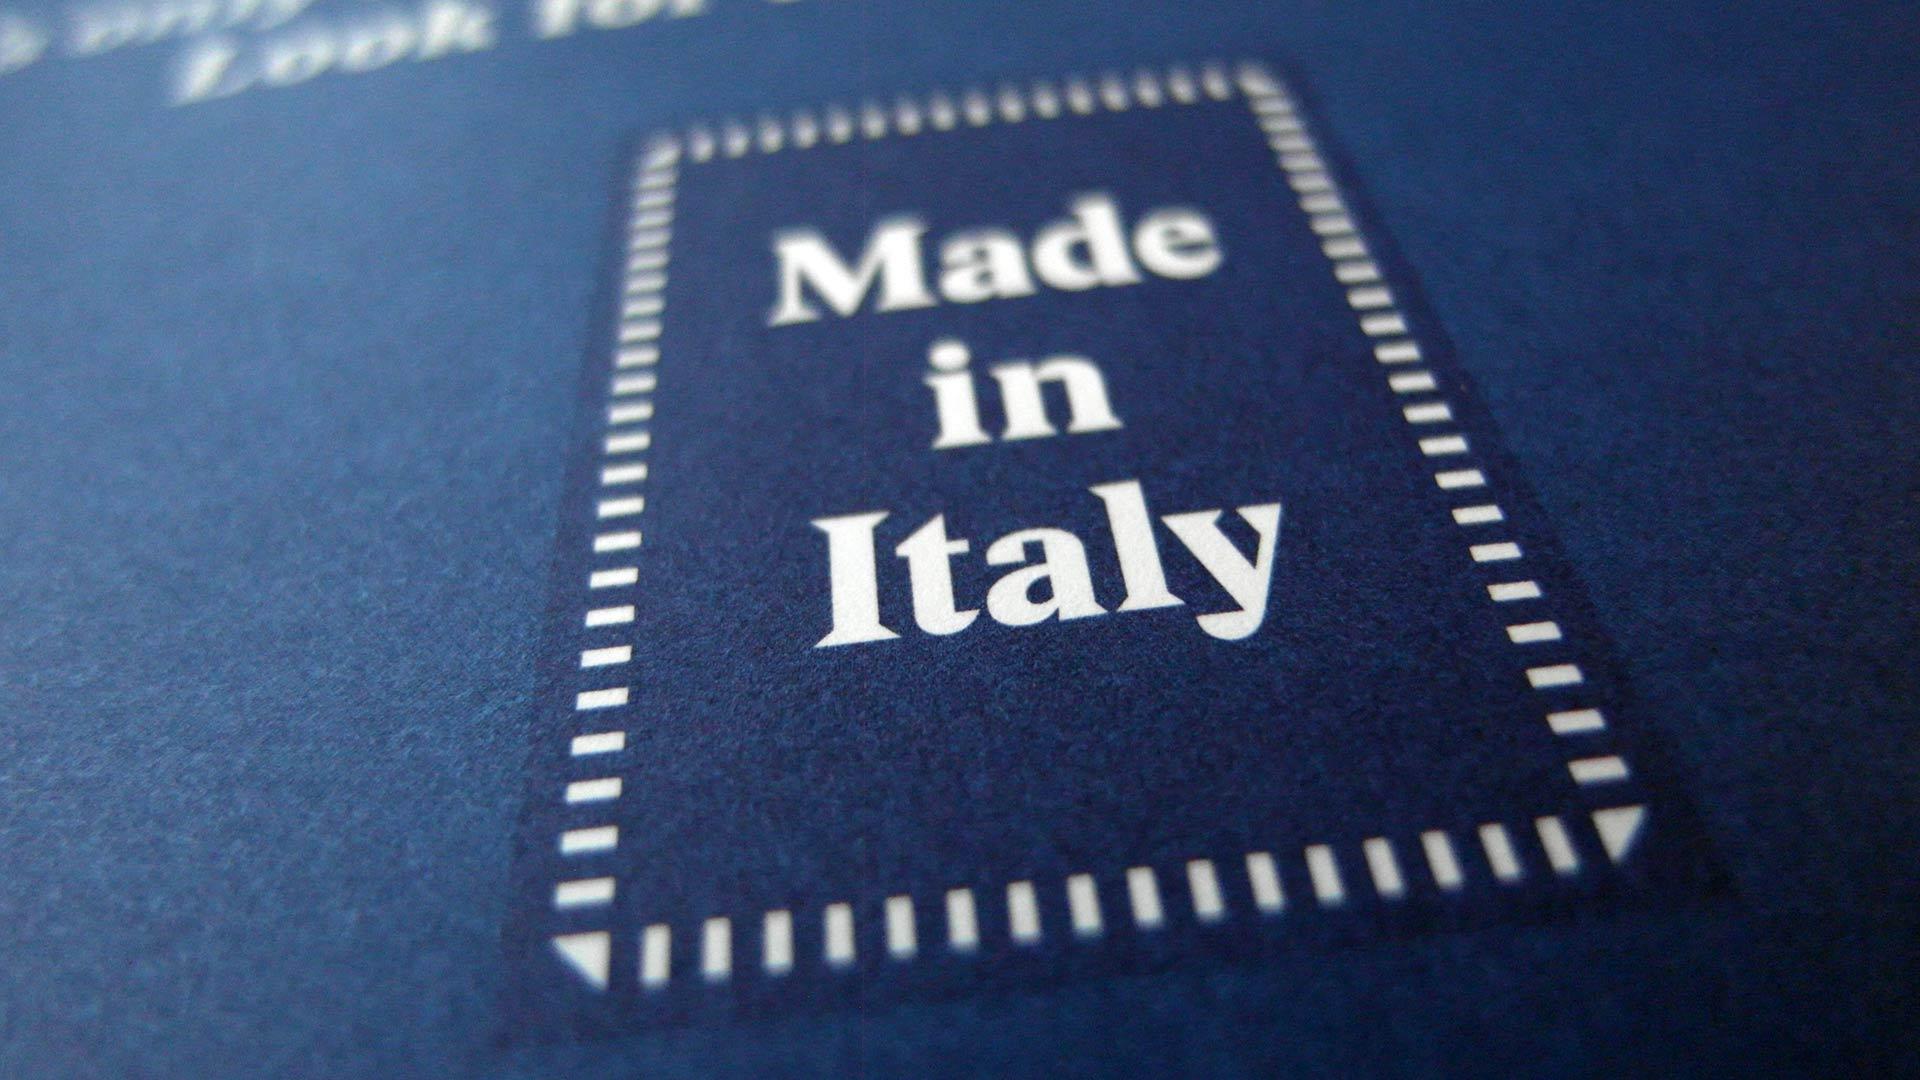 Celebrating Italian cuisine and wine